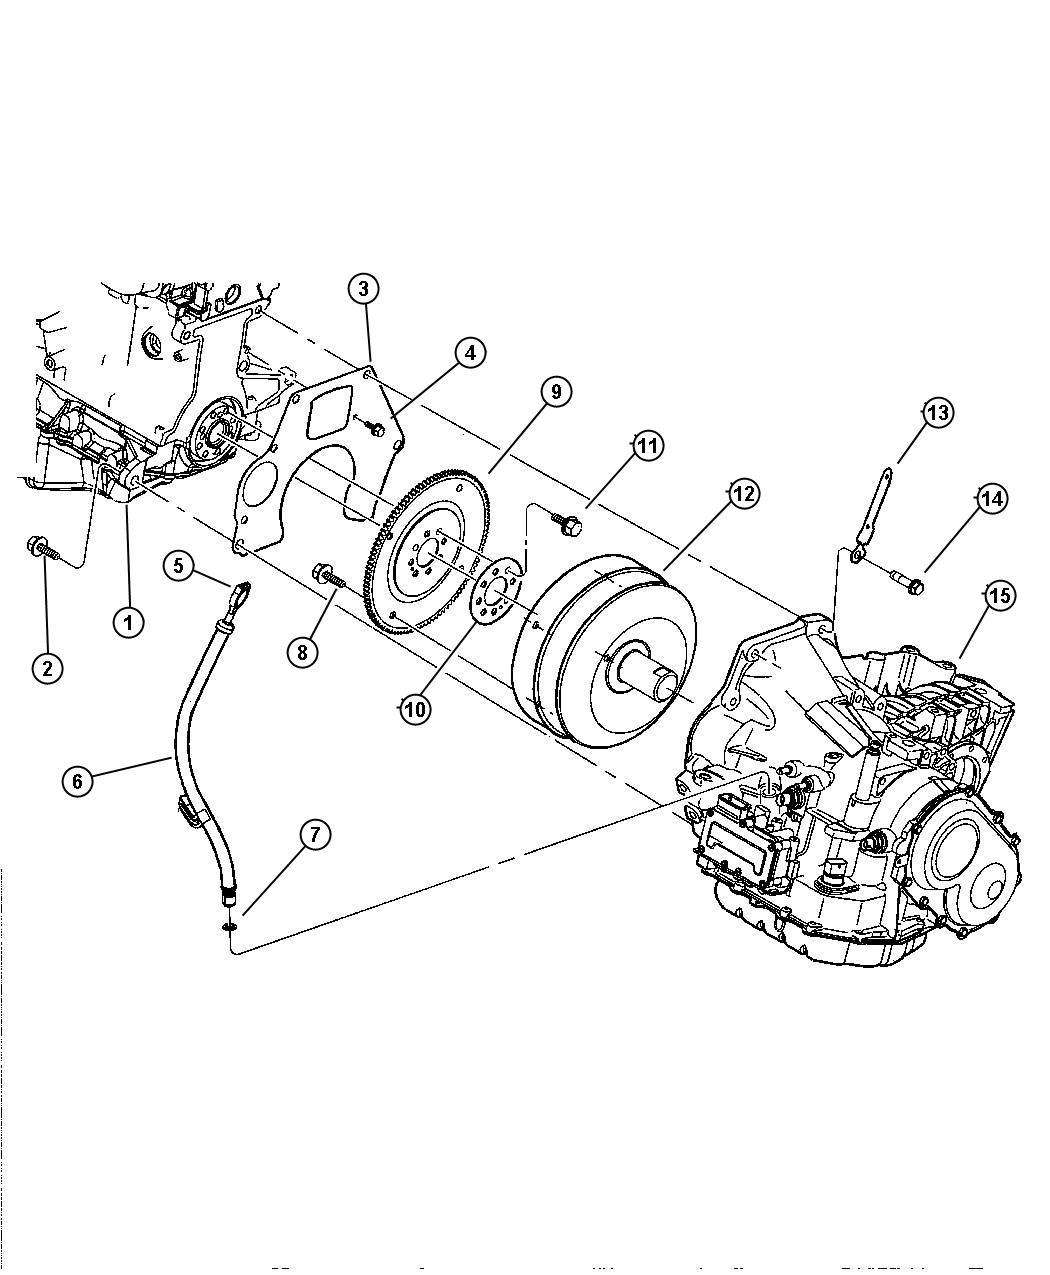 Chrysler Pt Cruiser Indicator. Transmission fluid level